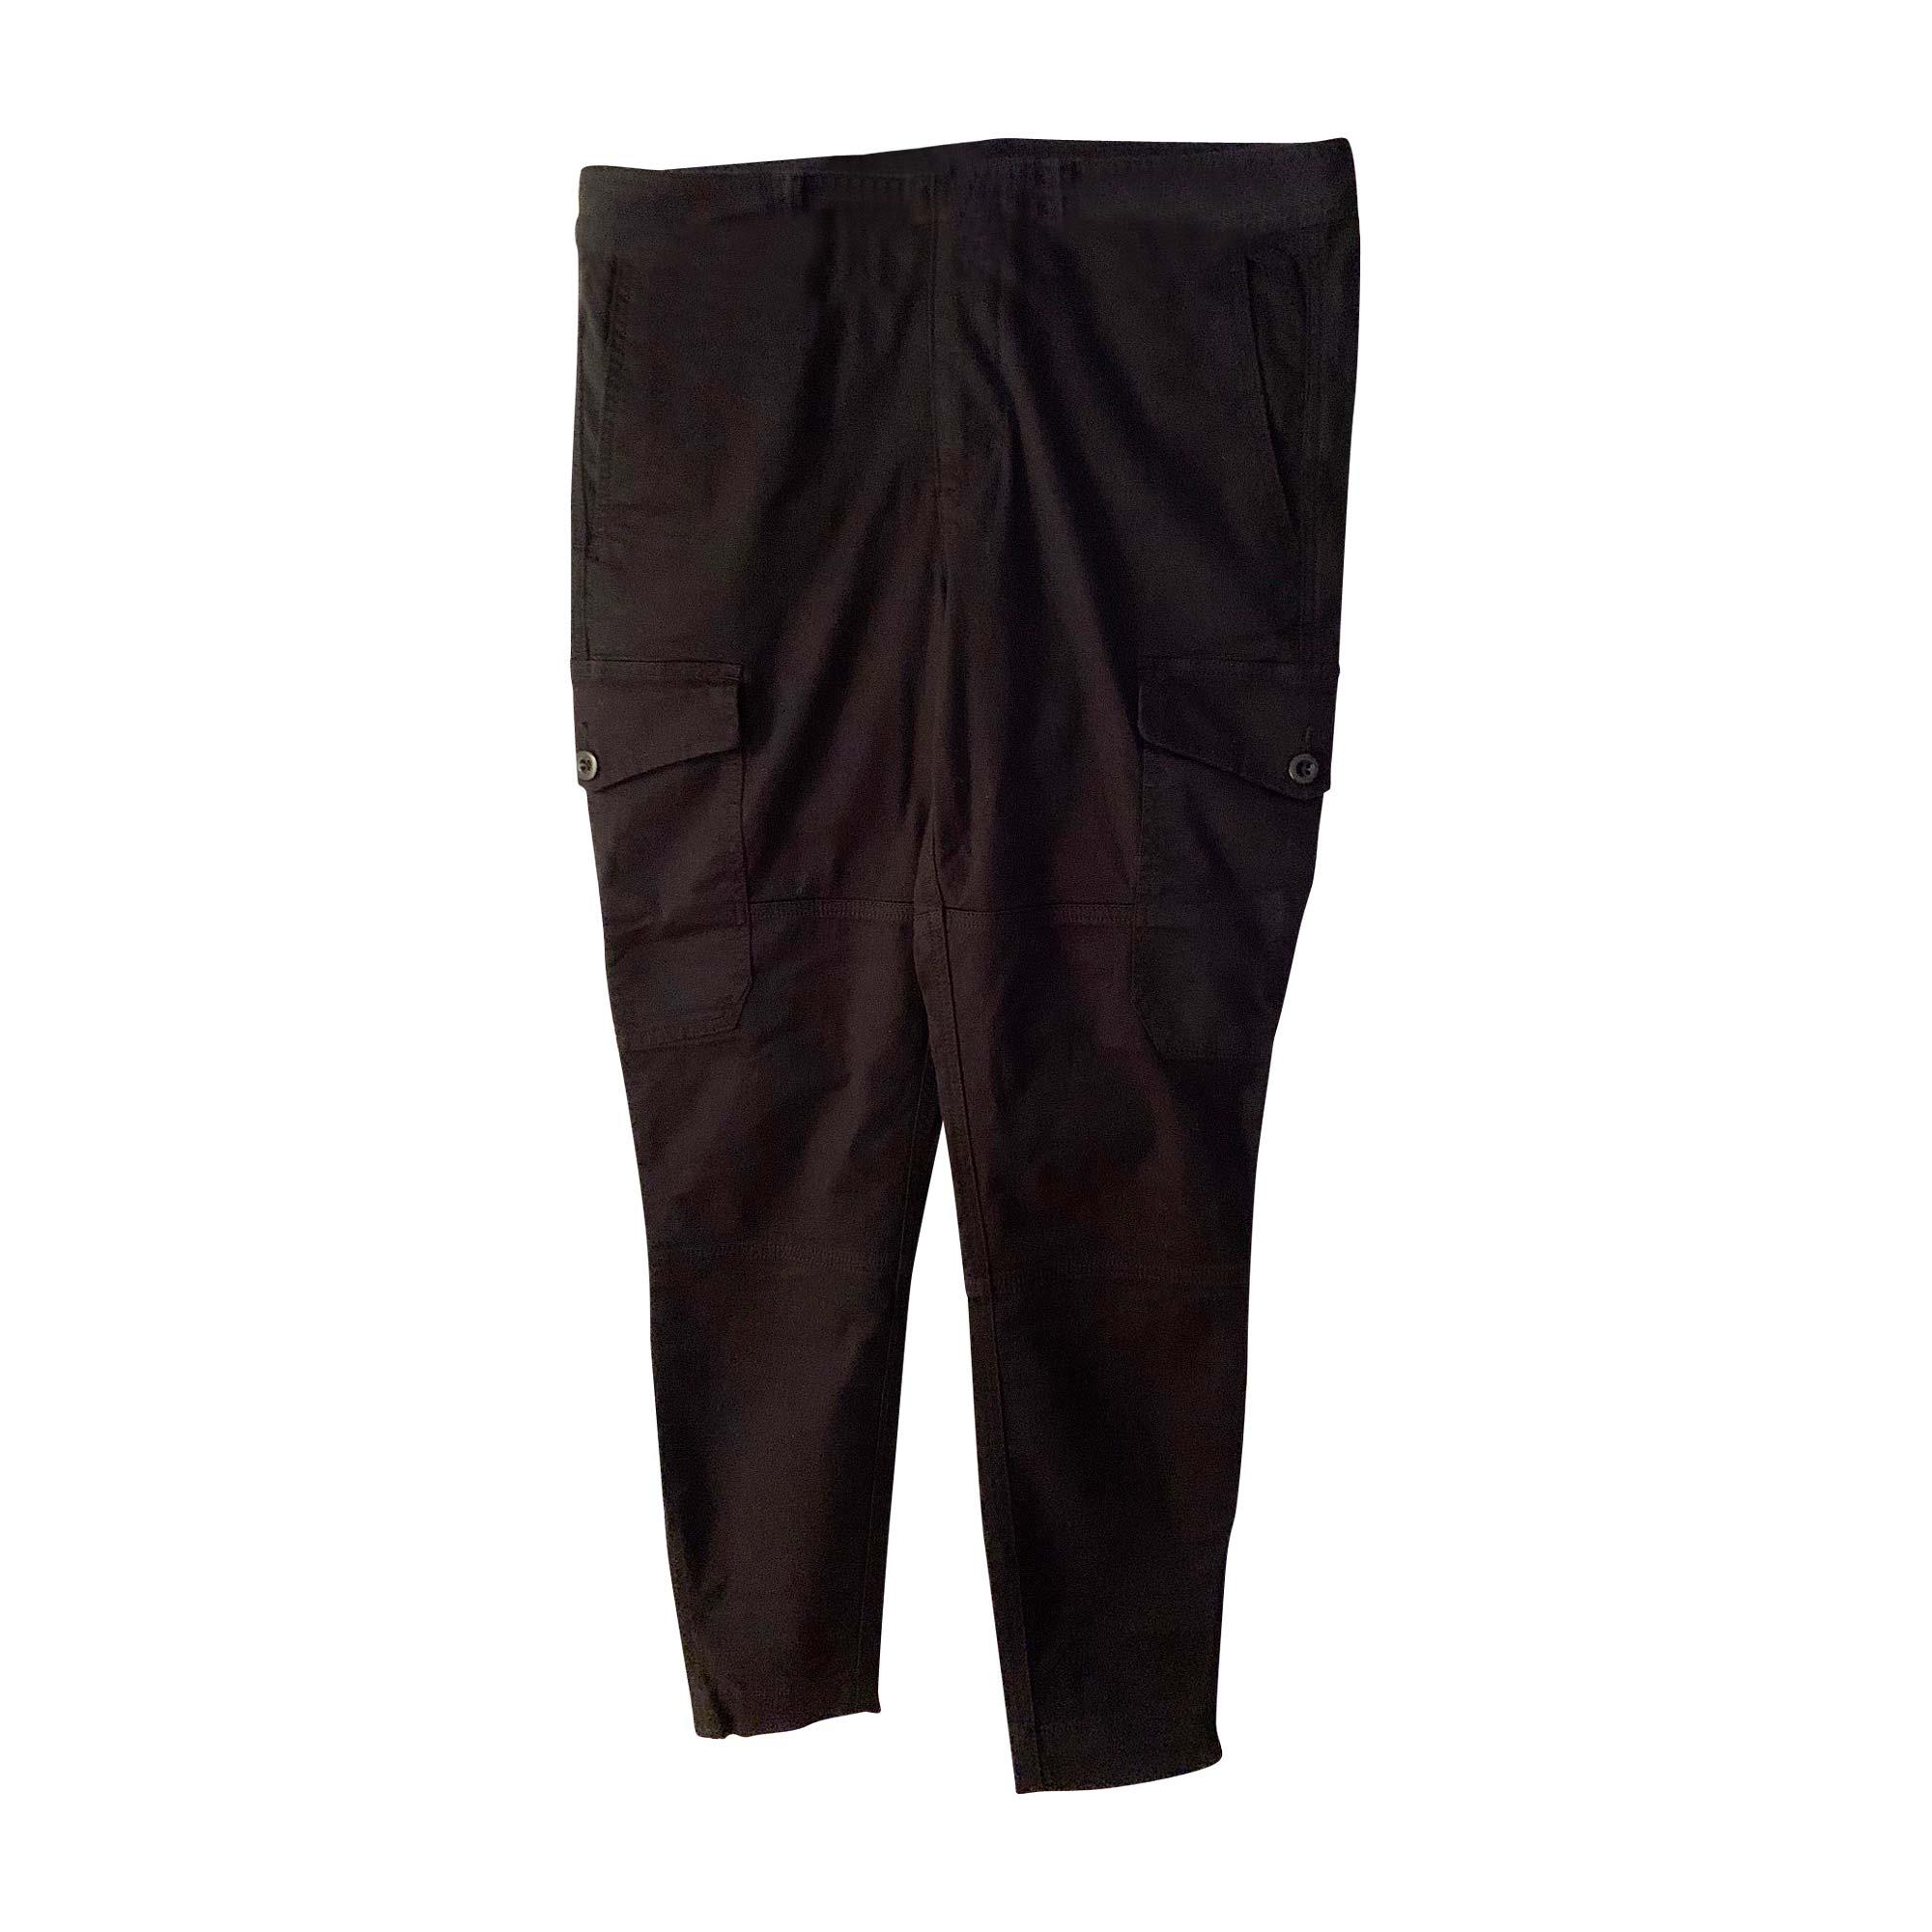 Pantalon slim, cigarette RALPH LAUREN Noir